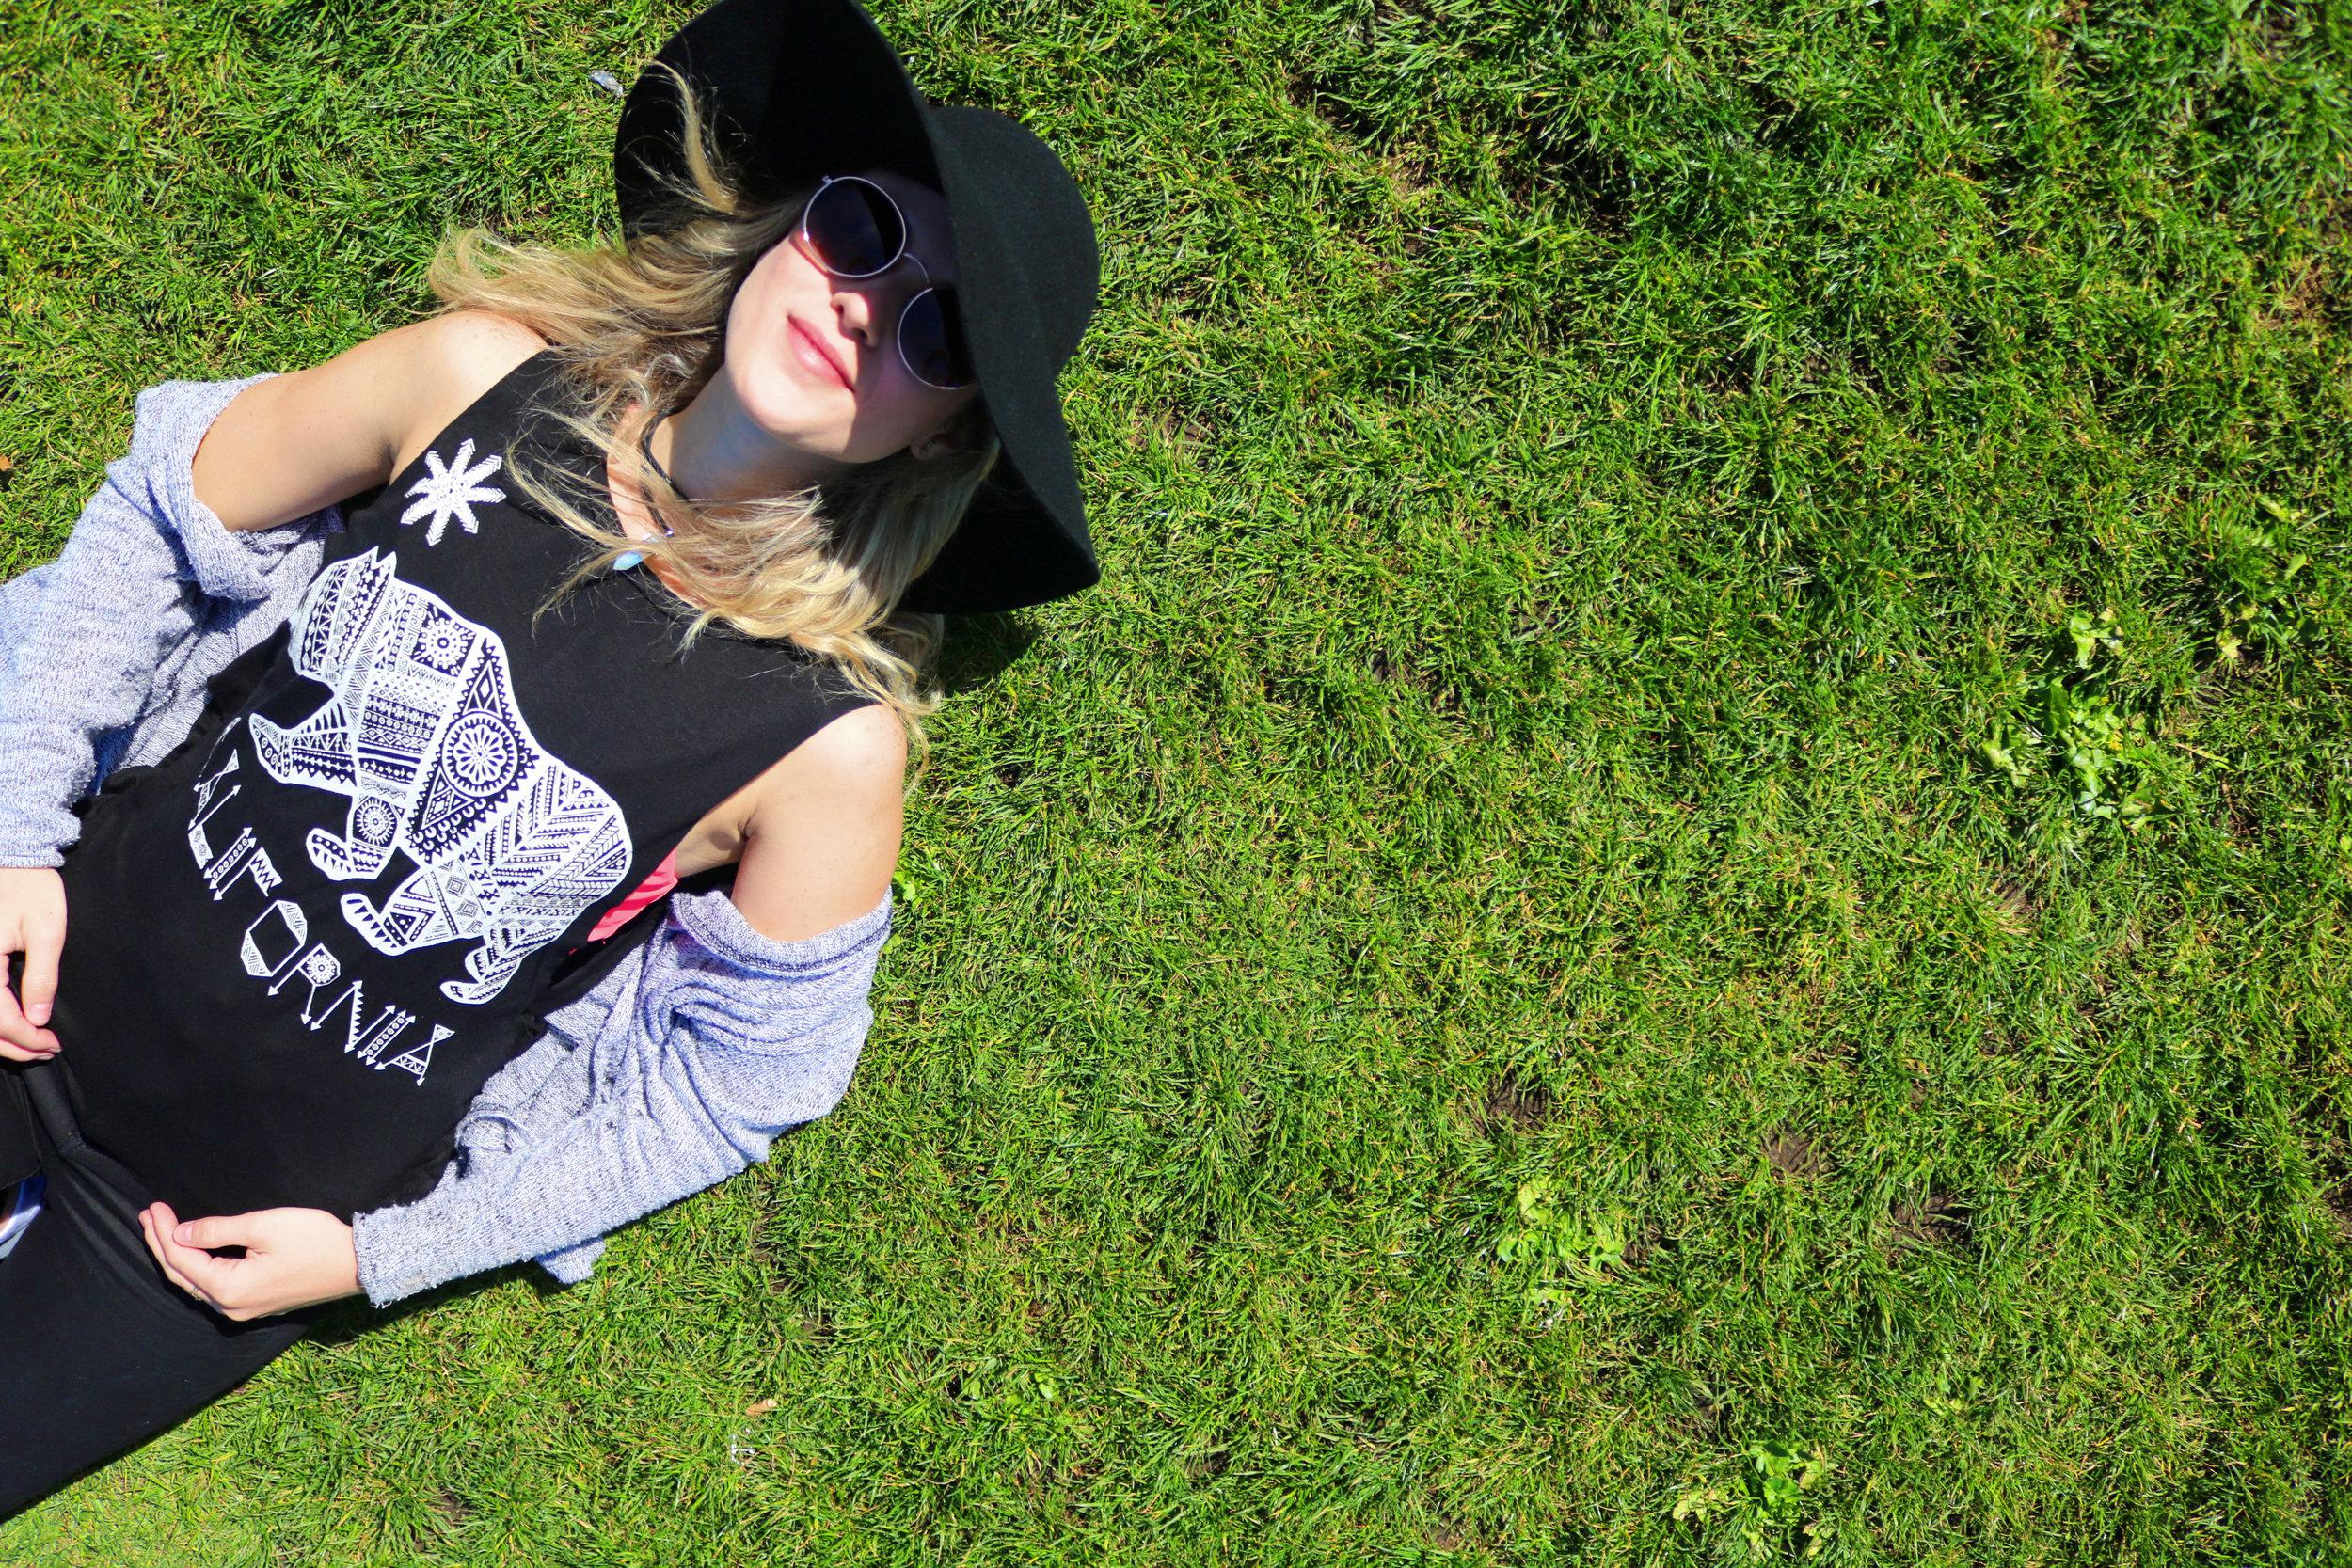 Floppy Hat: Bought in a Thrift Shop in Savannah/GA Sport Bra & Sunnies: Forever 21 California Muscle Tee: San Francisco City Wear Black Jeans & Cardigan: H&M Purse: Kate Spade Sneaker: Nike